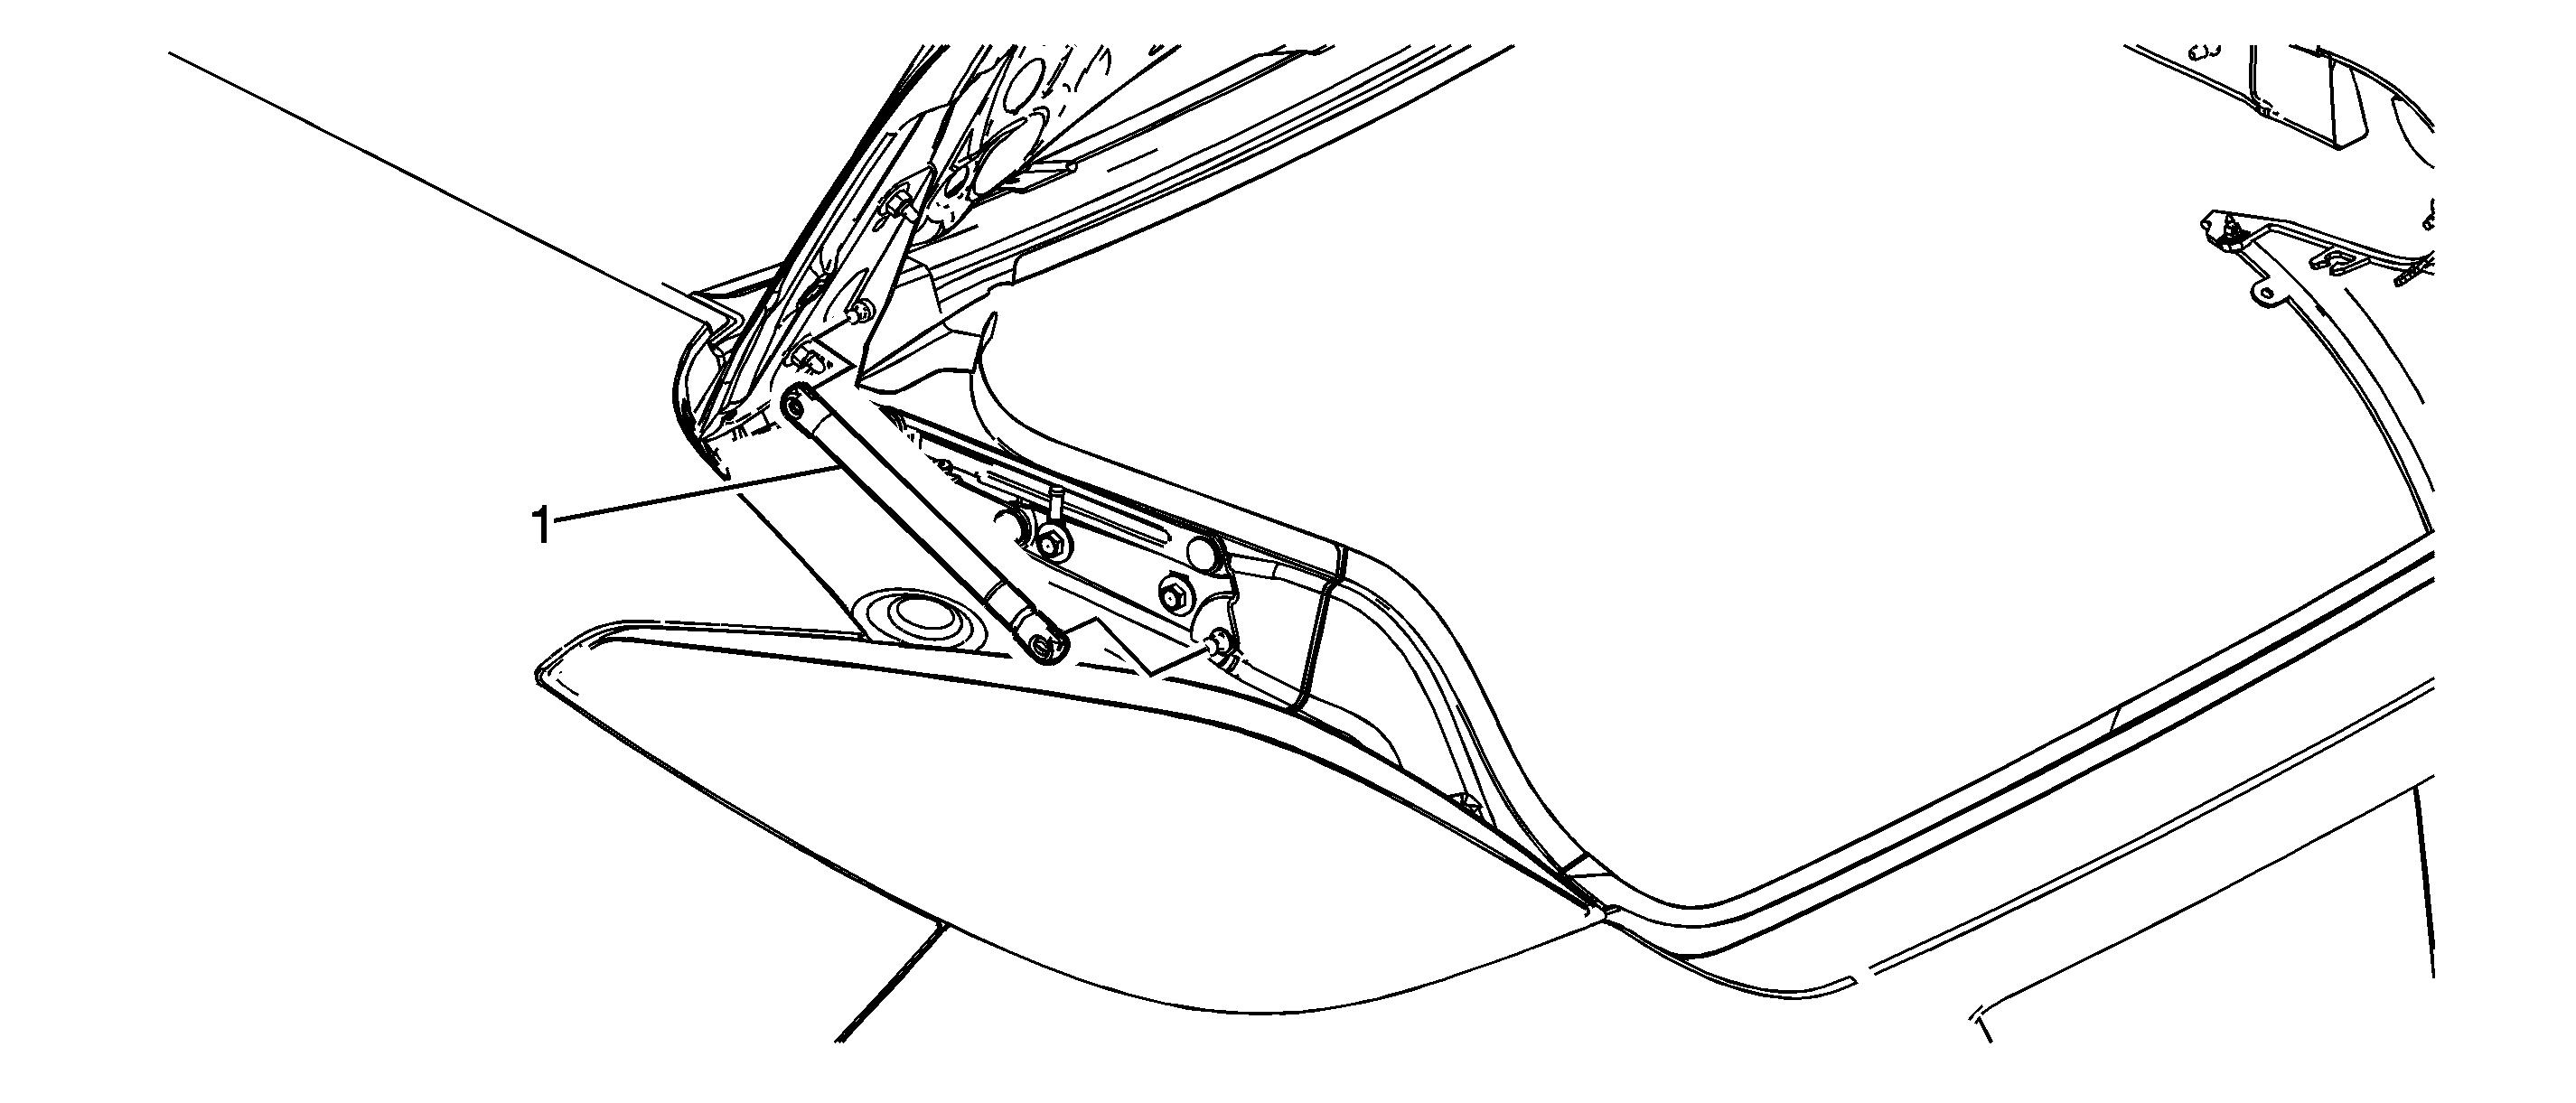 Pontiac G6 Rear Suspension Diagram